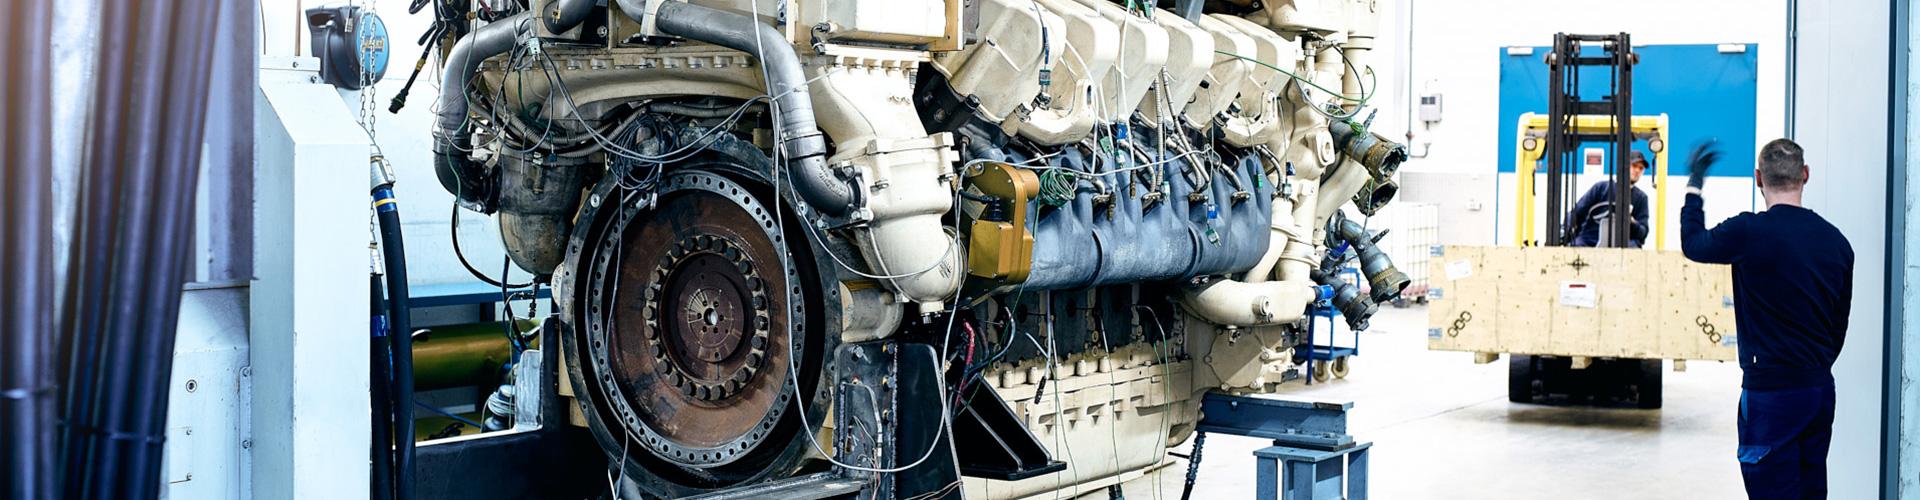 Heavy-duty engines – industry / railway / marine